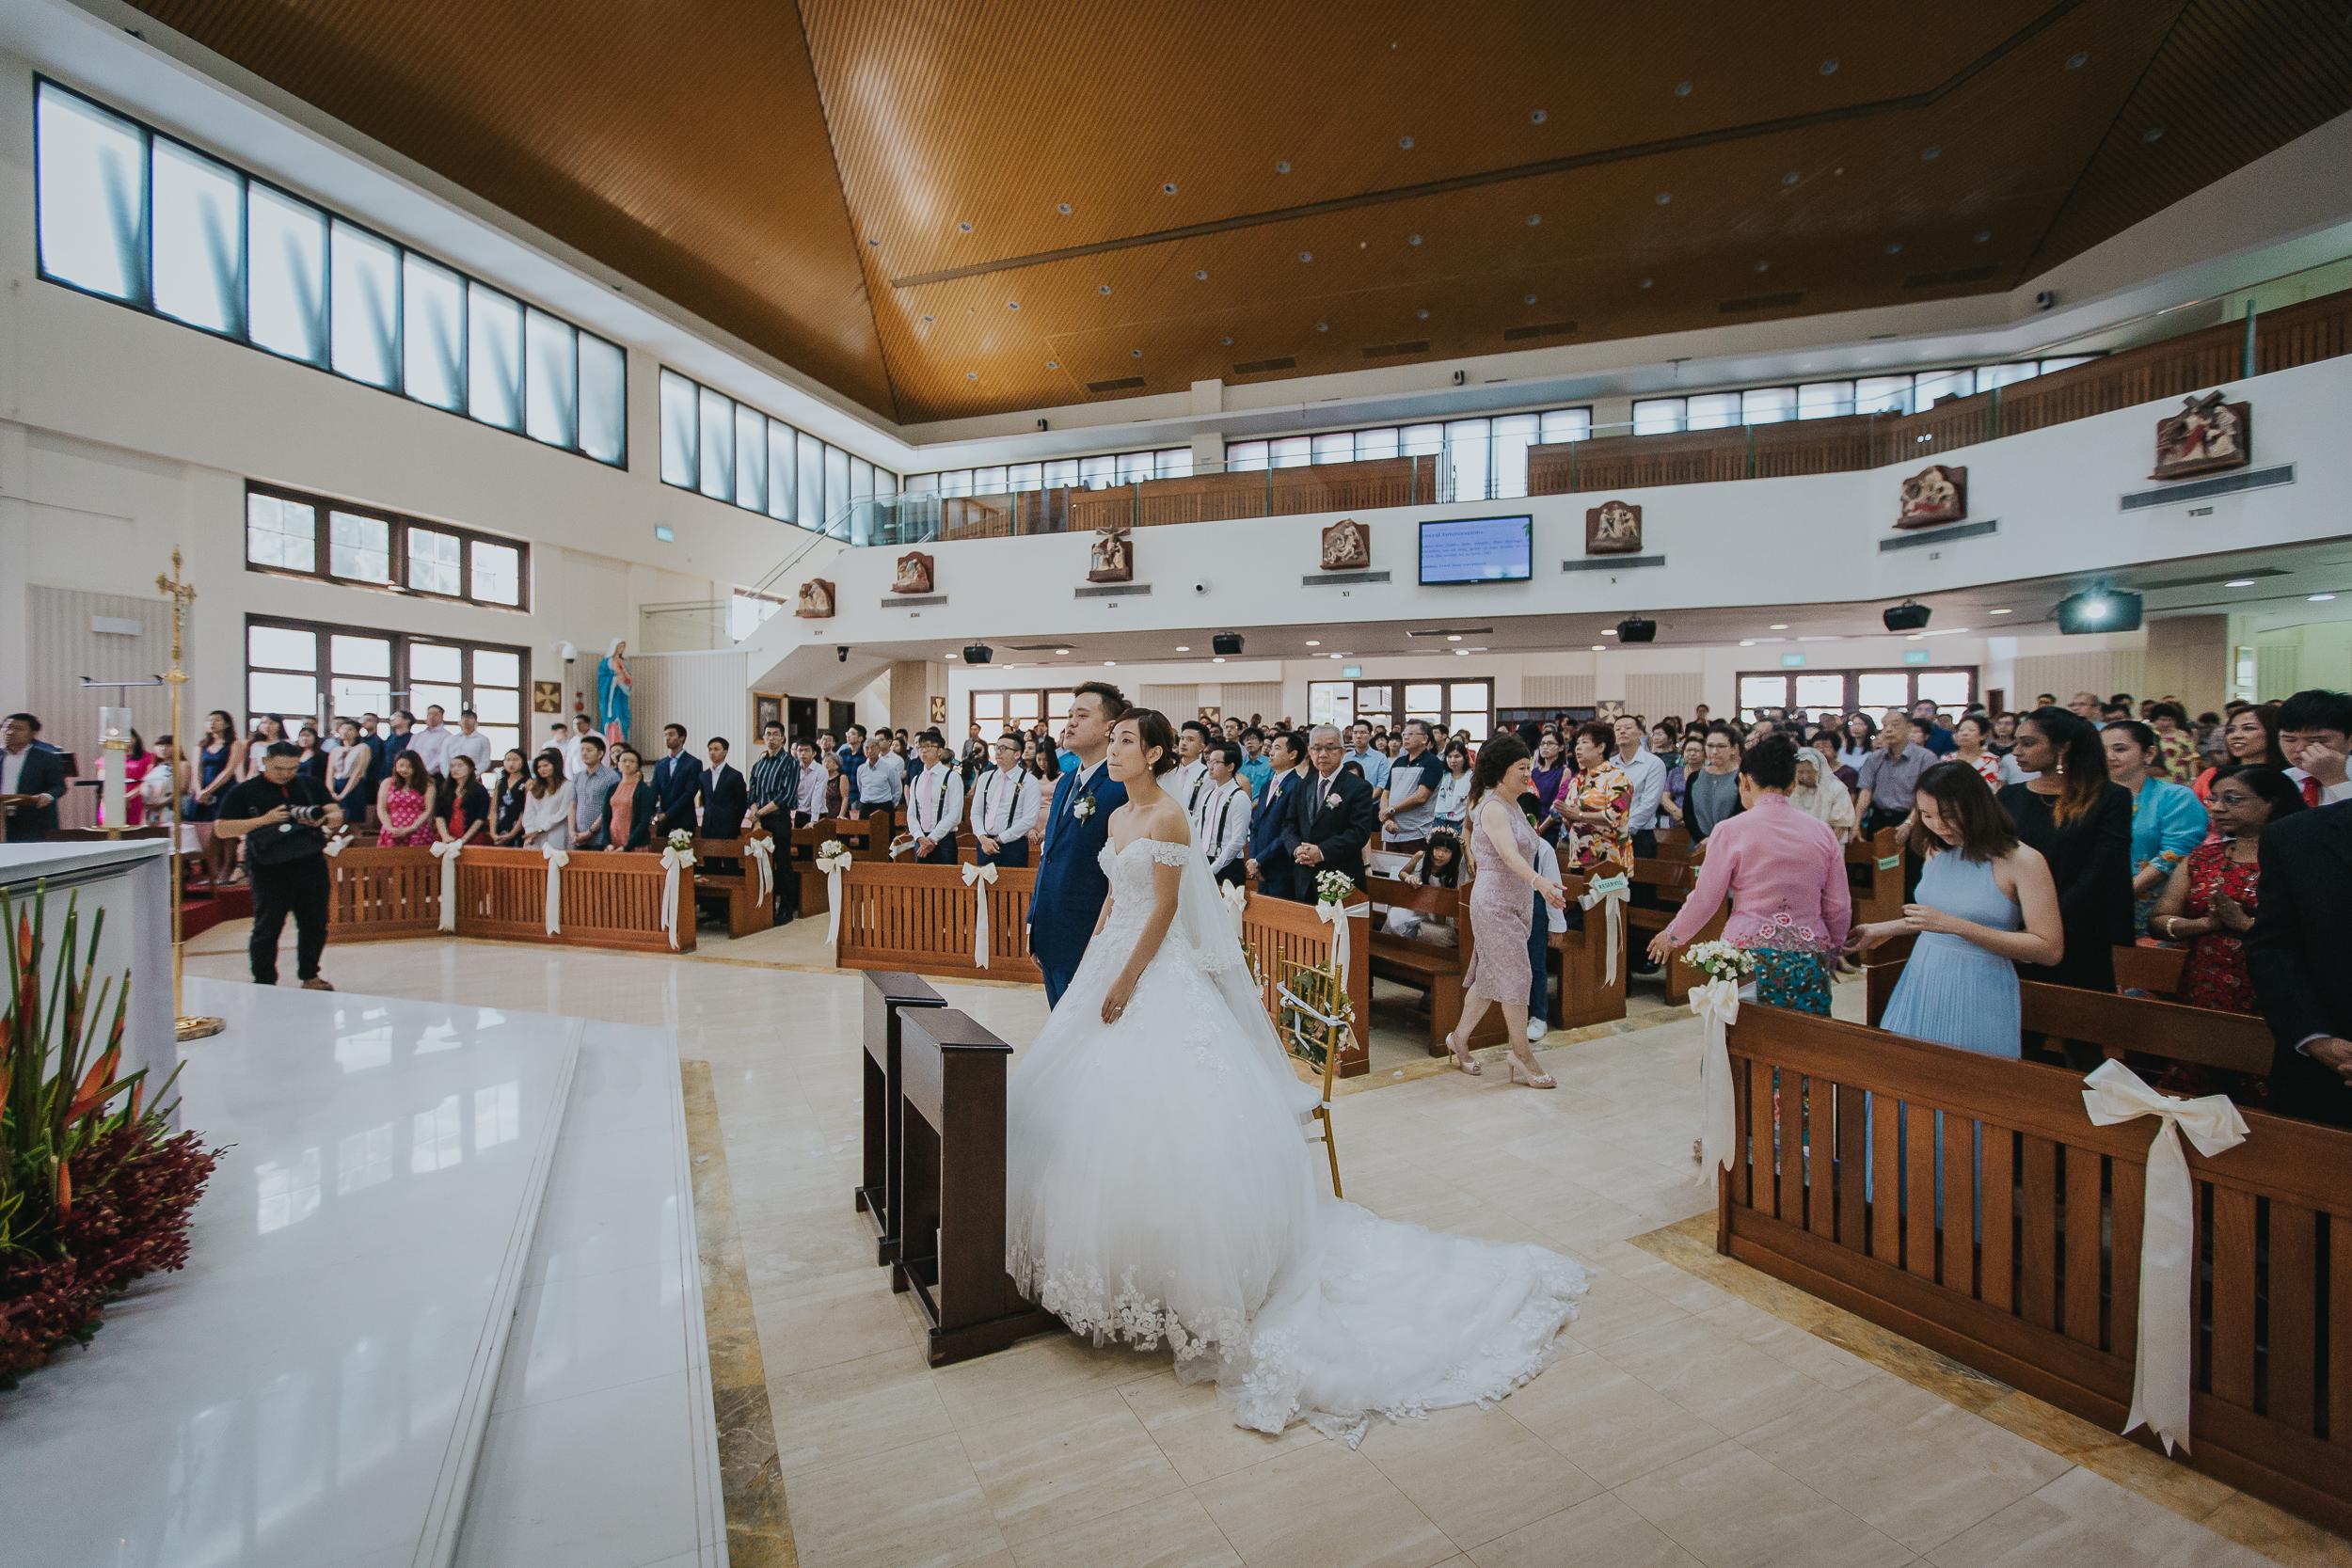 Singapore+Actual+Day+Wedding+Photographer+Grand+Mercure+Oliver+Estelle-0058.jpg